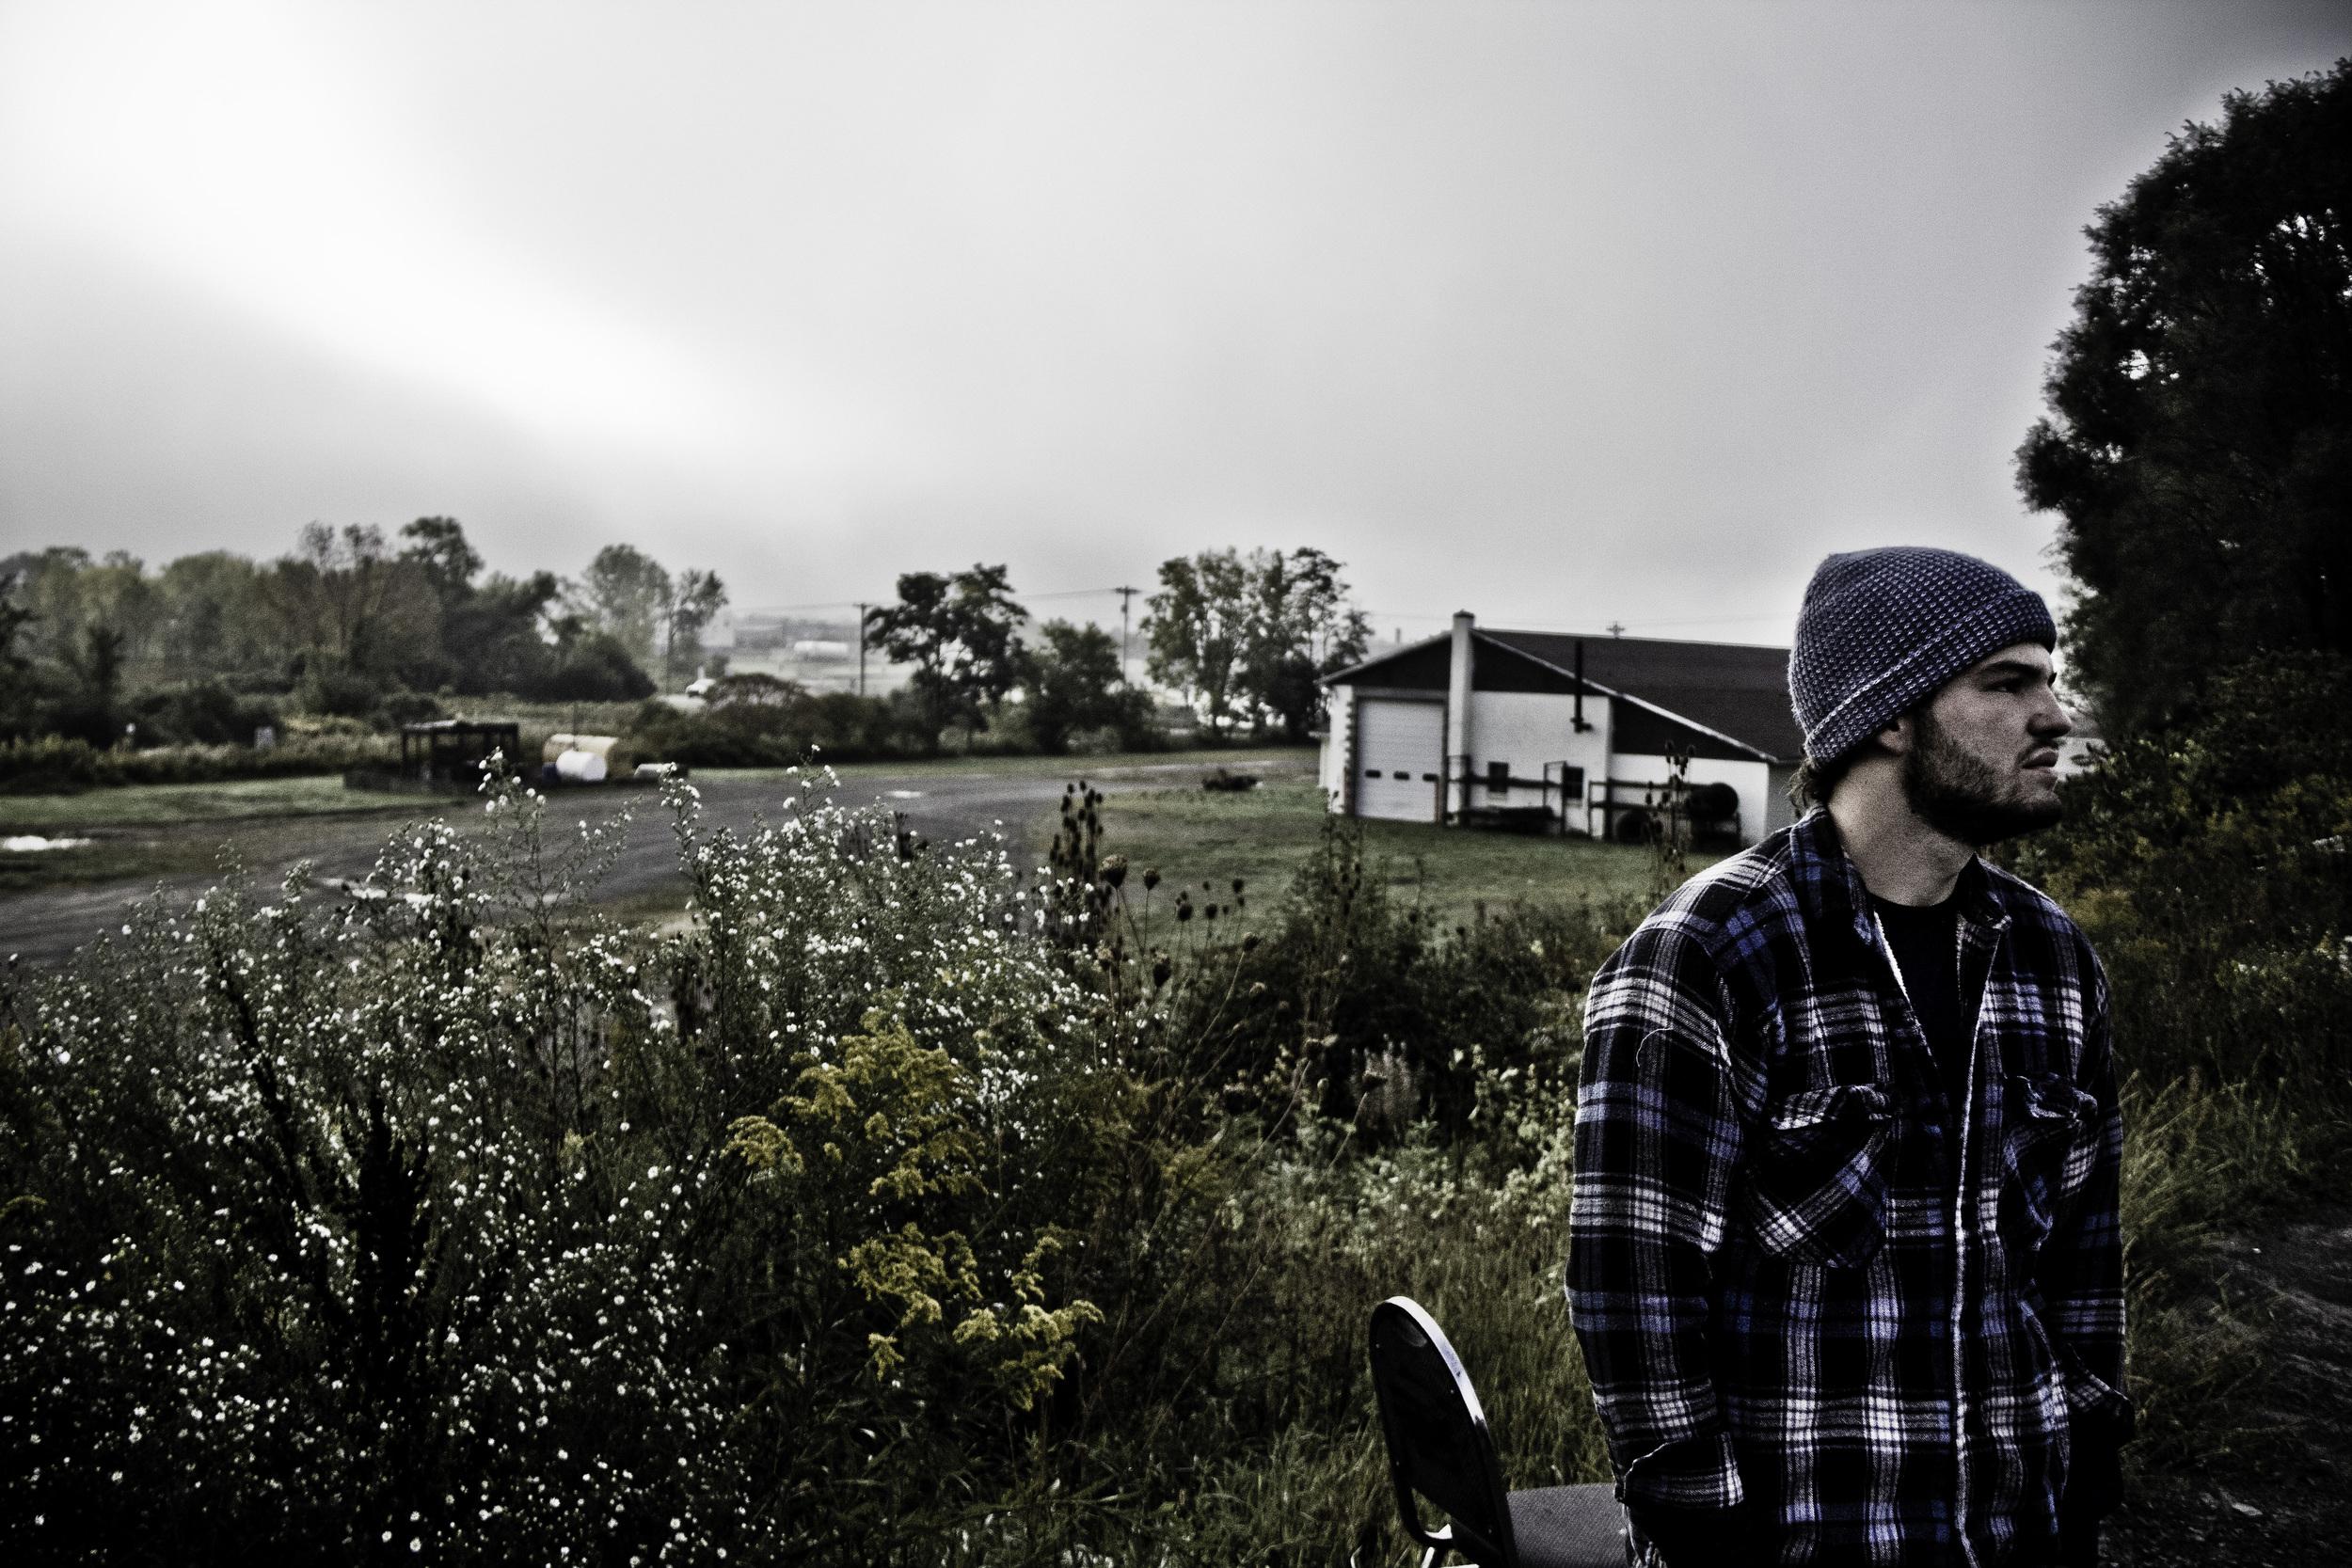 brad_patocka_Waterboy.jpg